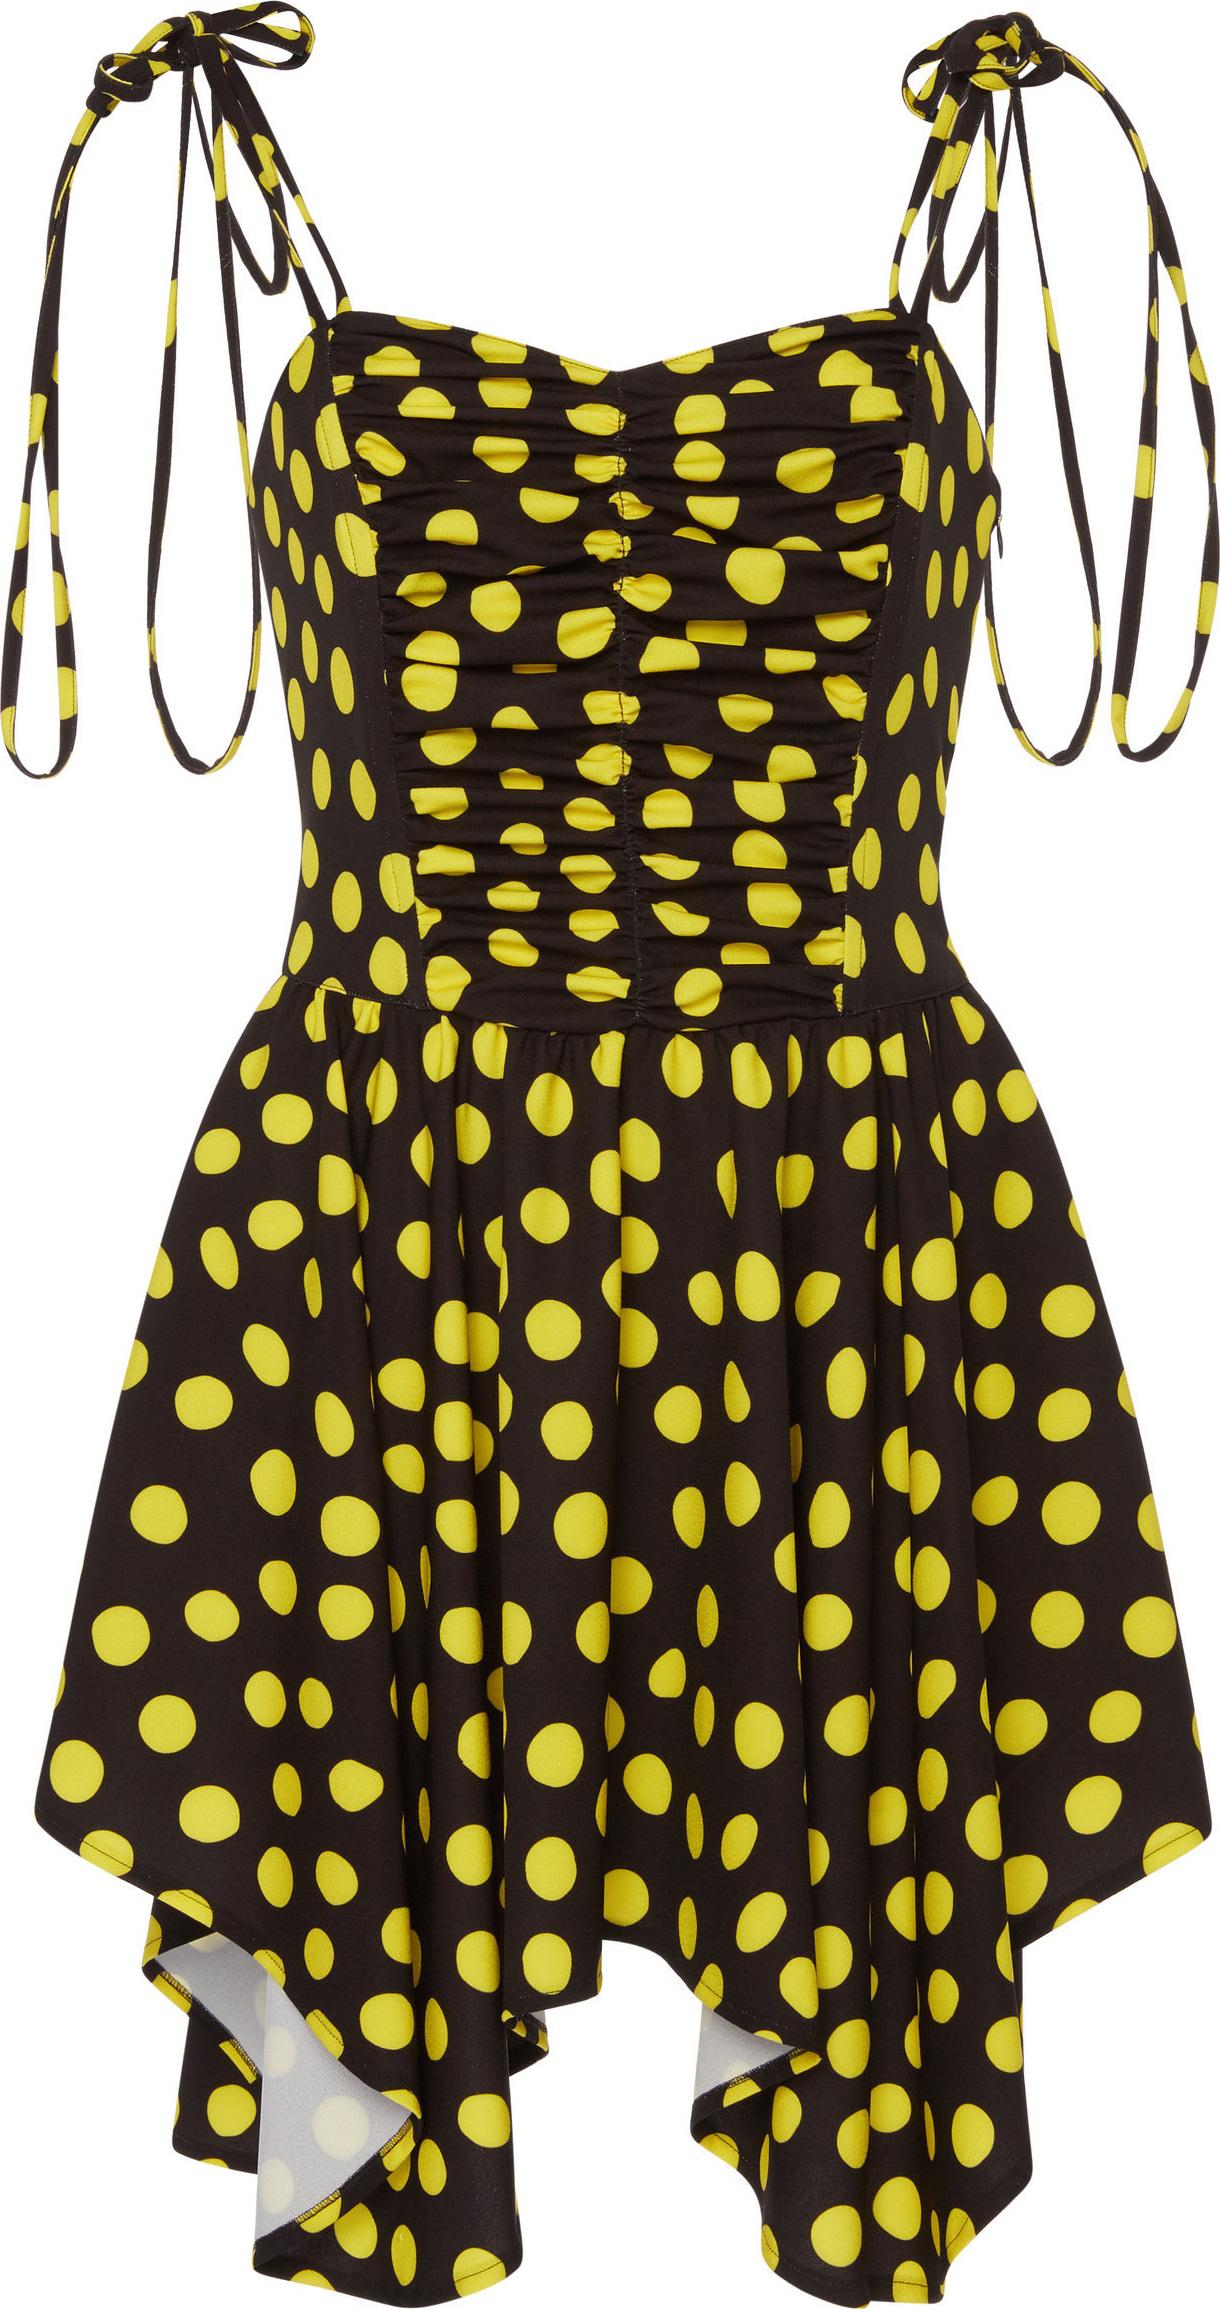 Attico - Cady Polka Dot Dress